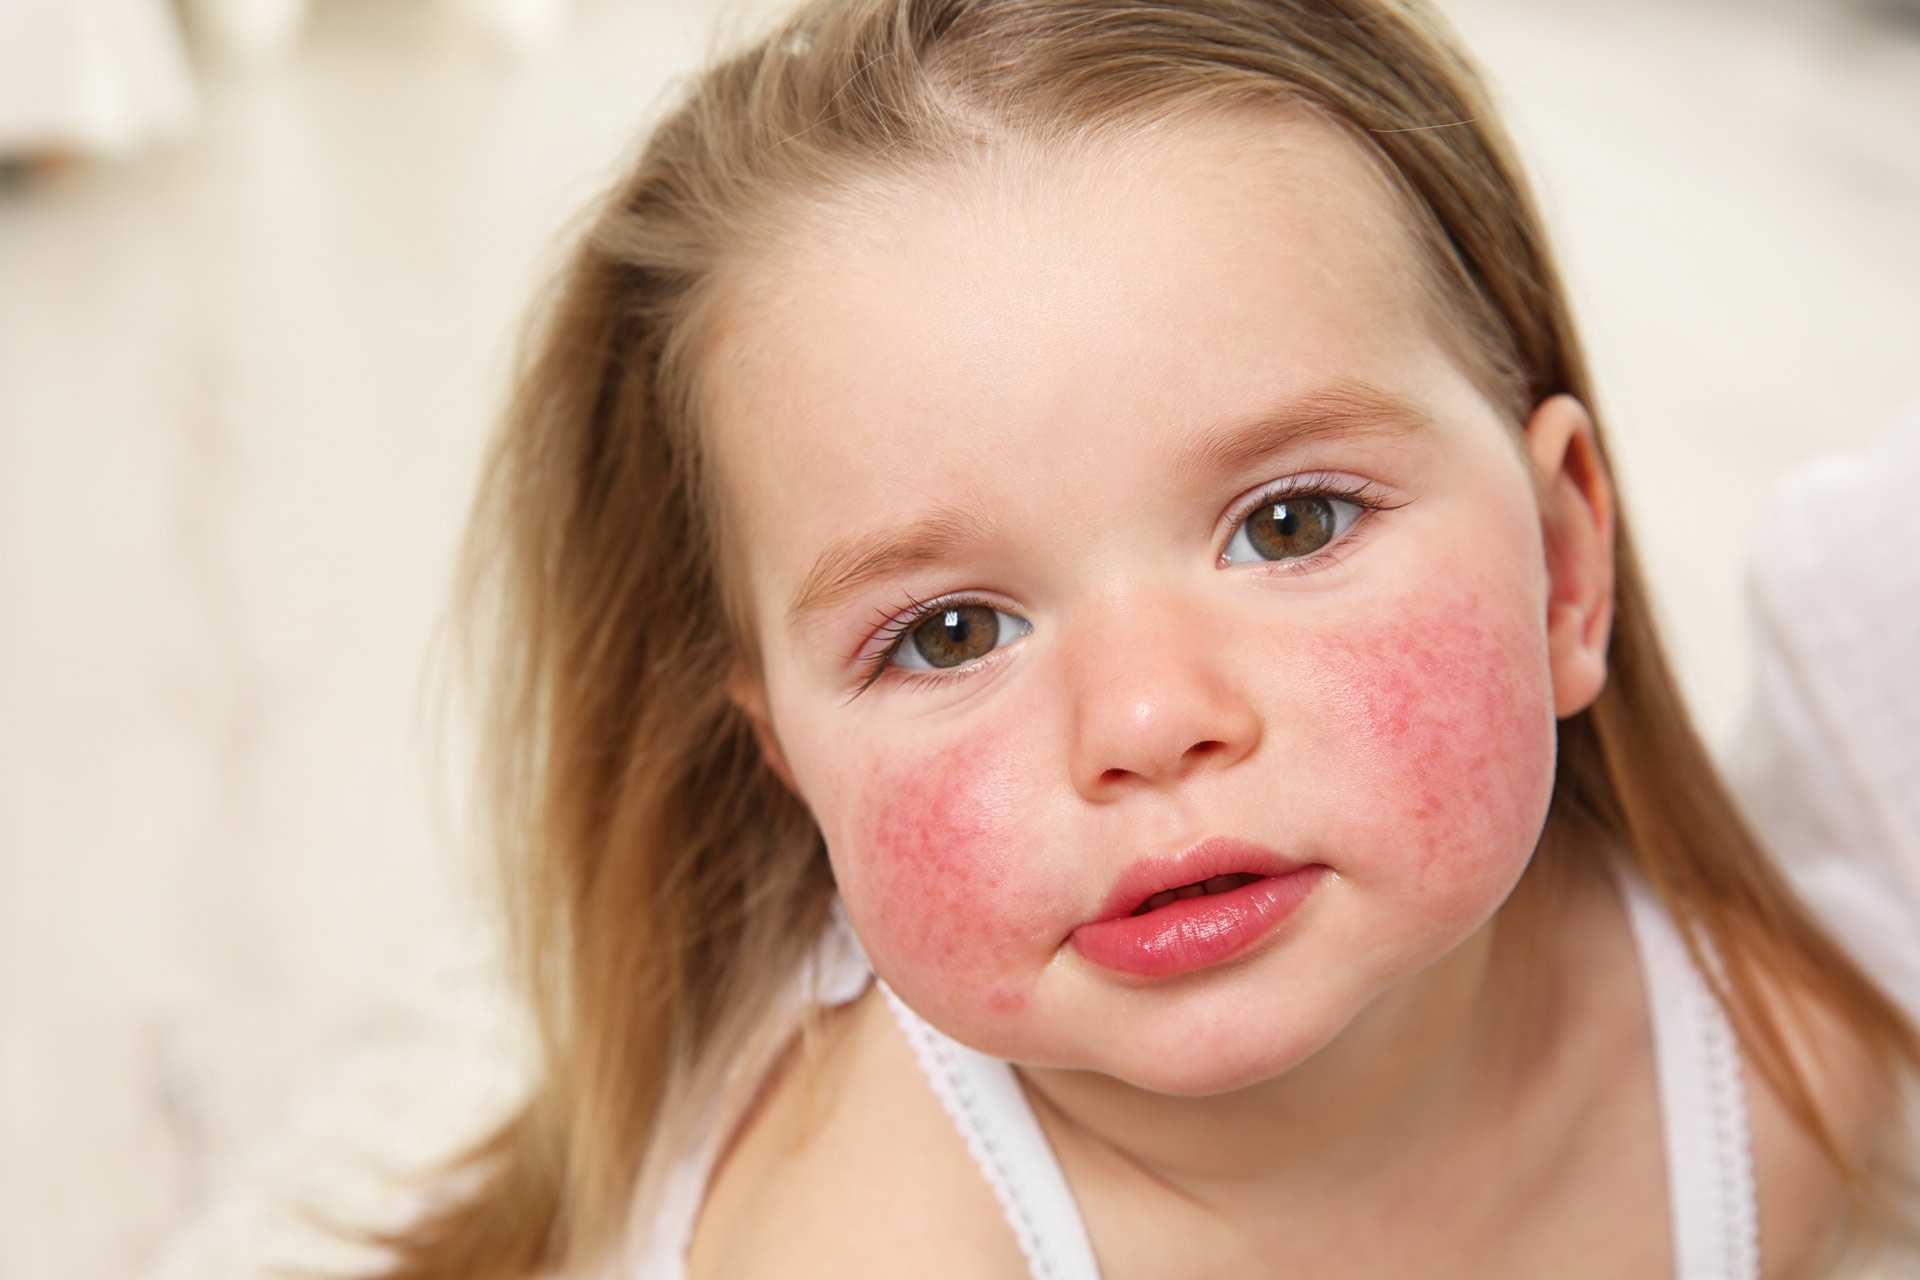 rimedi naturali allergia bambini